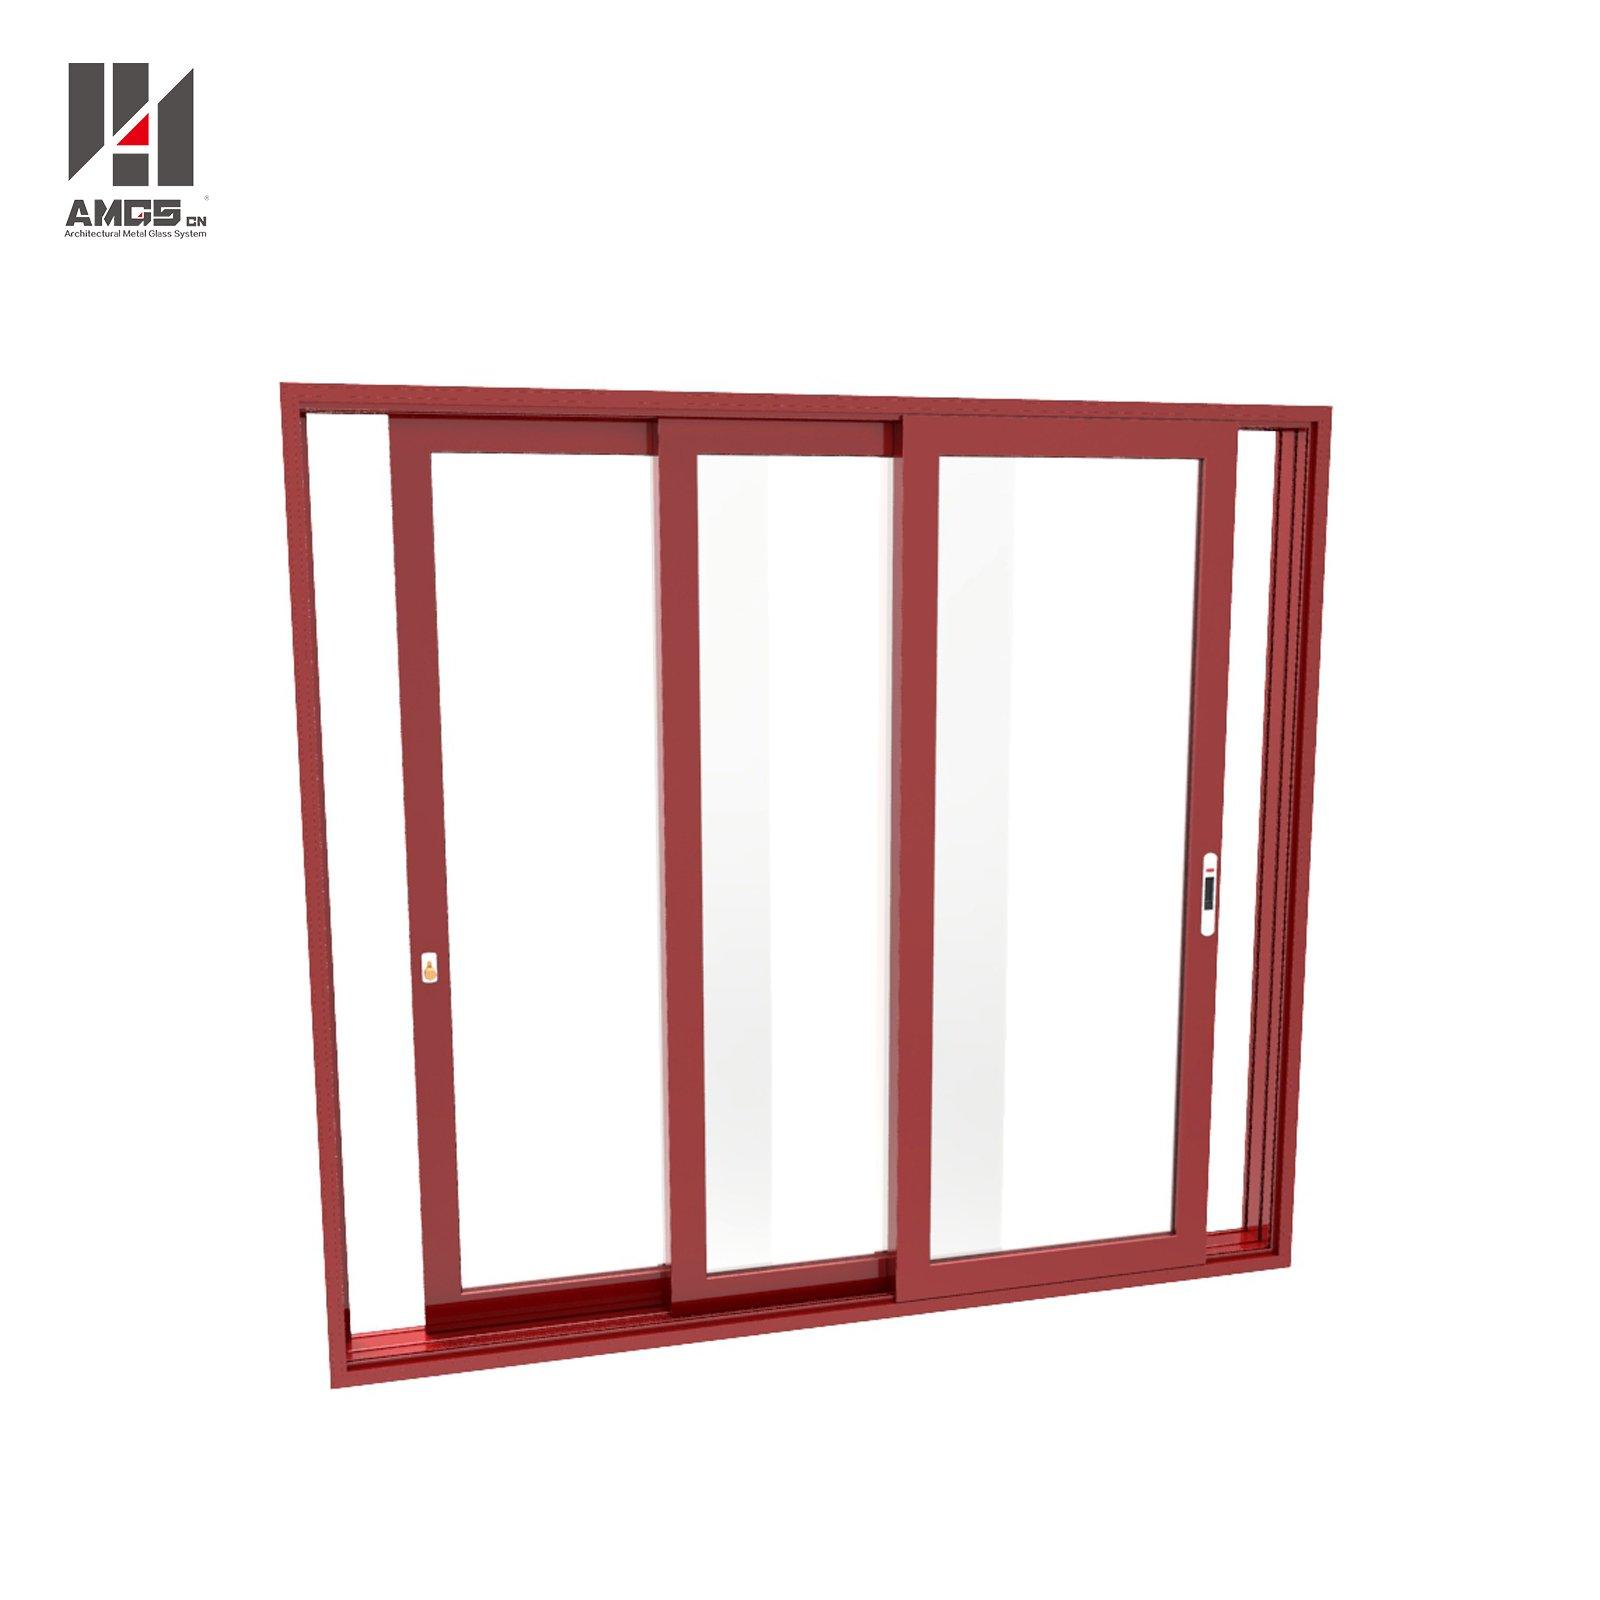 AMGS Customized Aluminum Sliding Door For Commercial And Residen Aluminum Sliding Doors image7